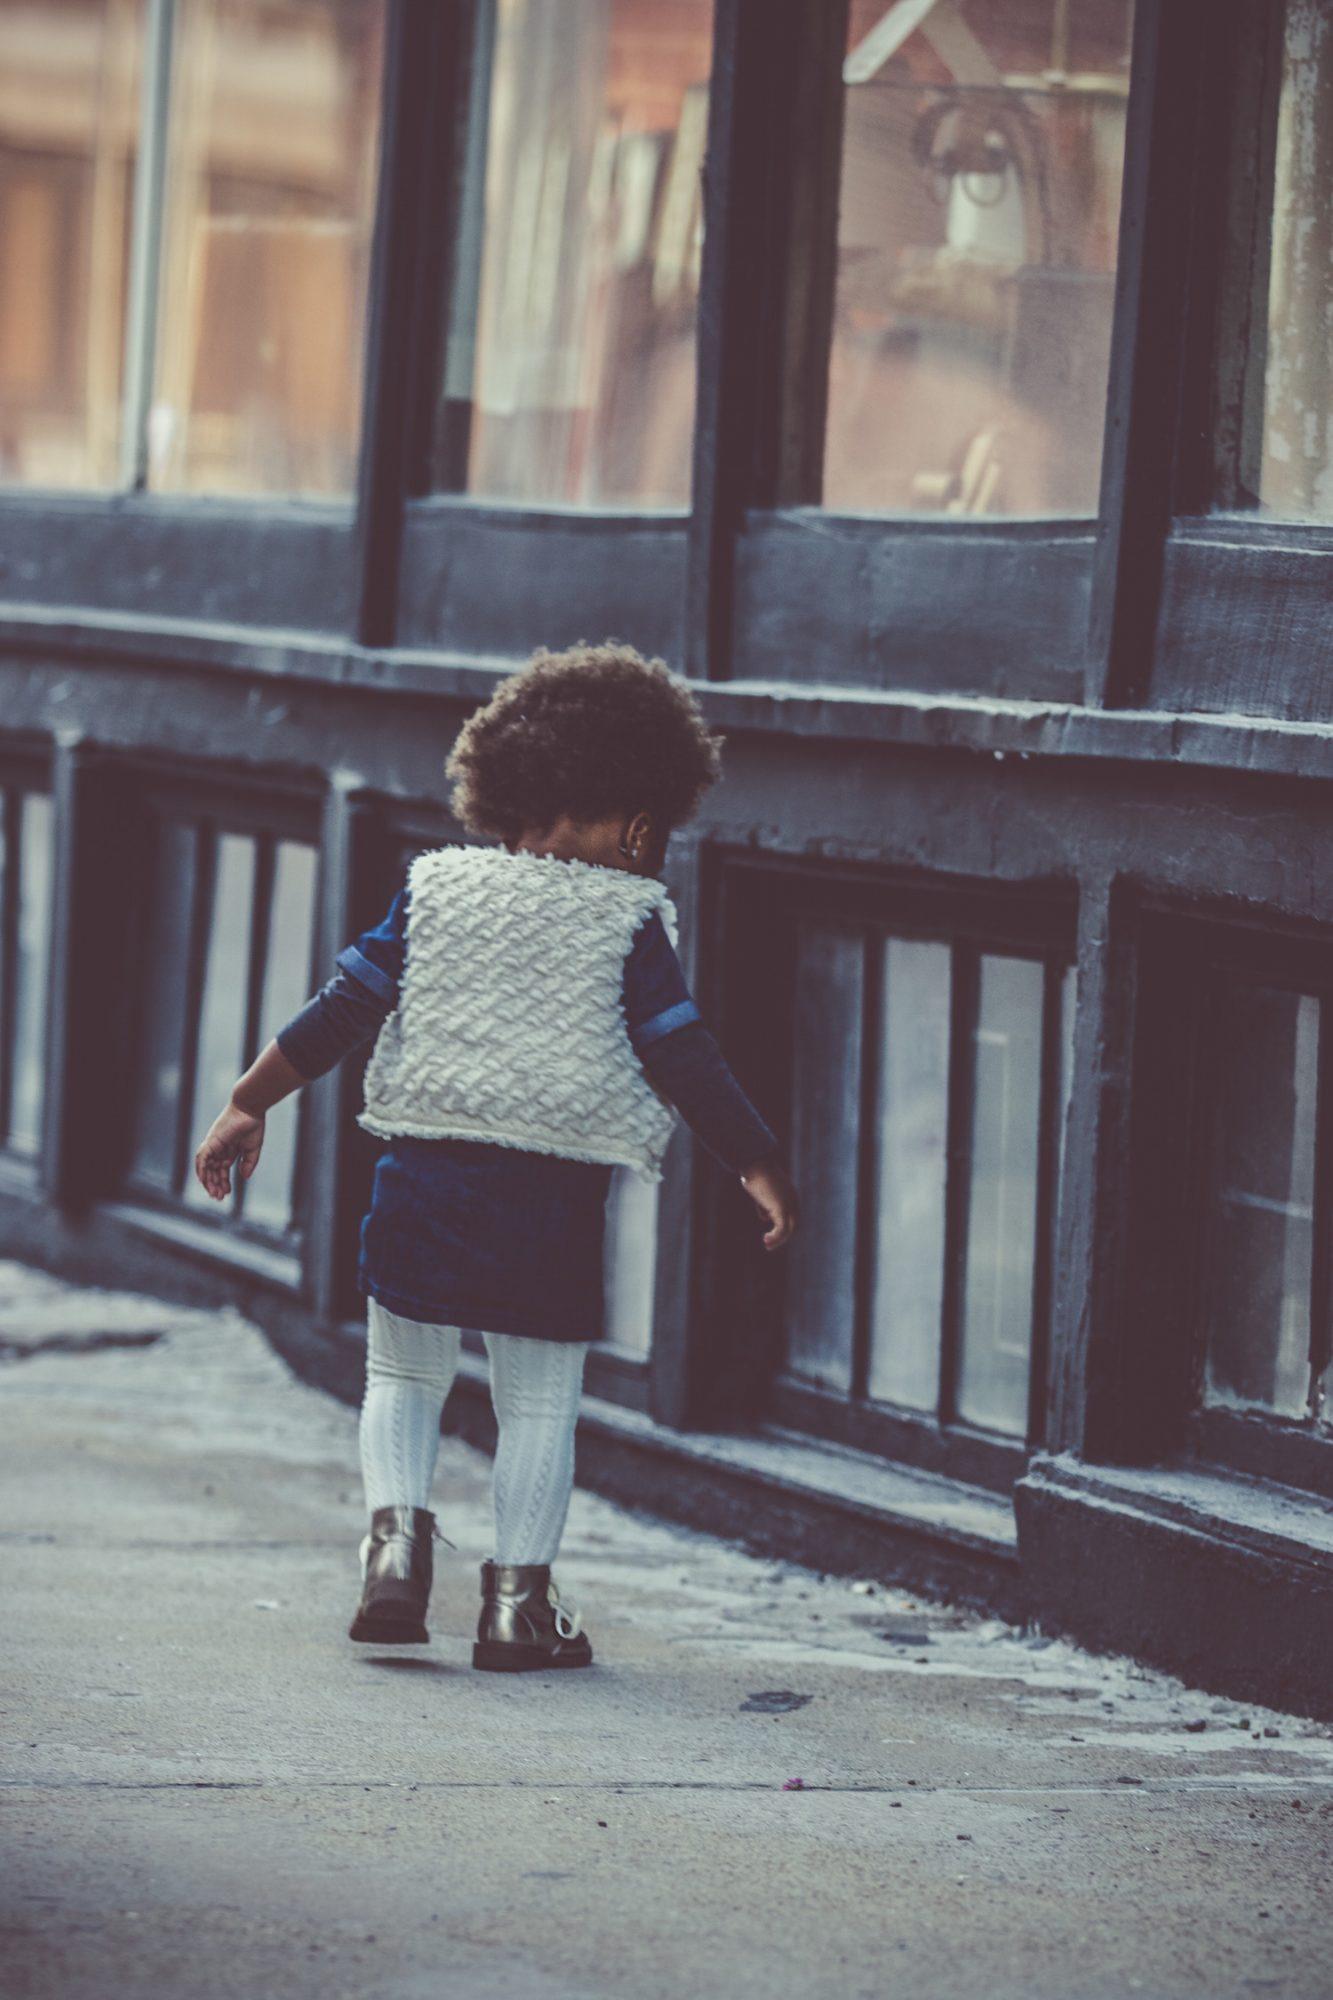 Young Black girl walking down the sidewalk